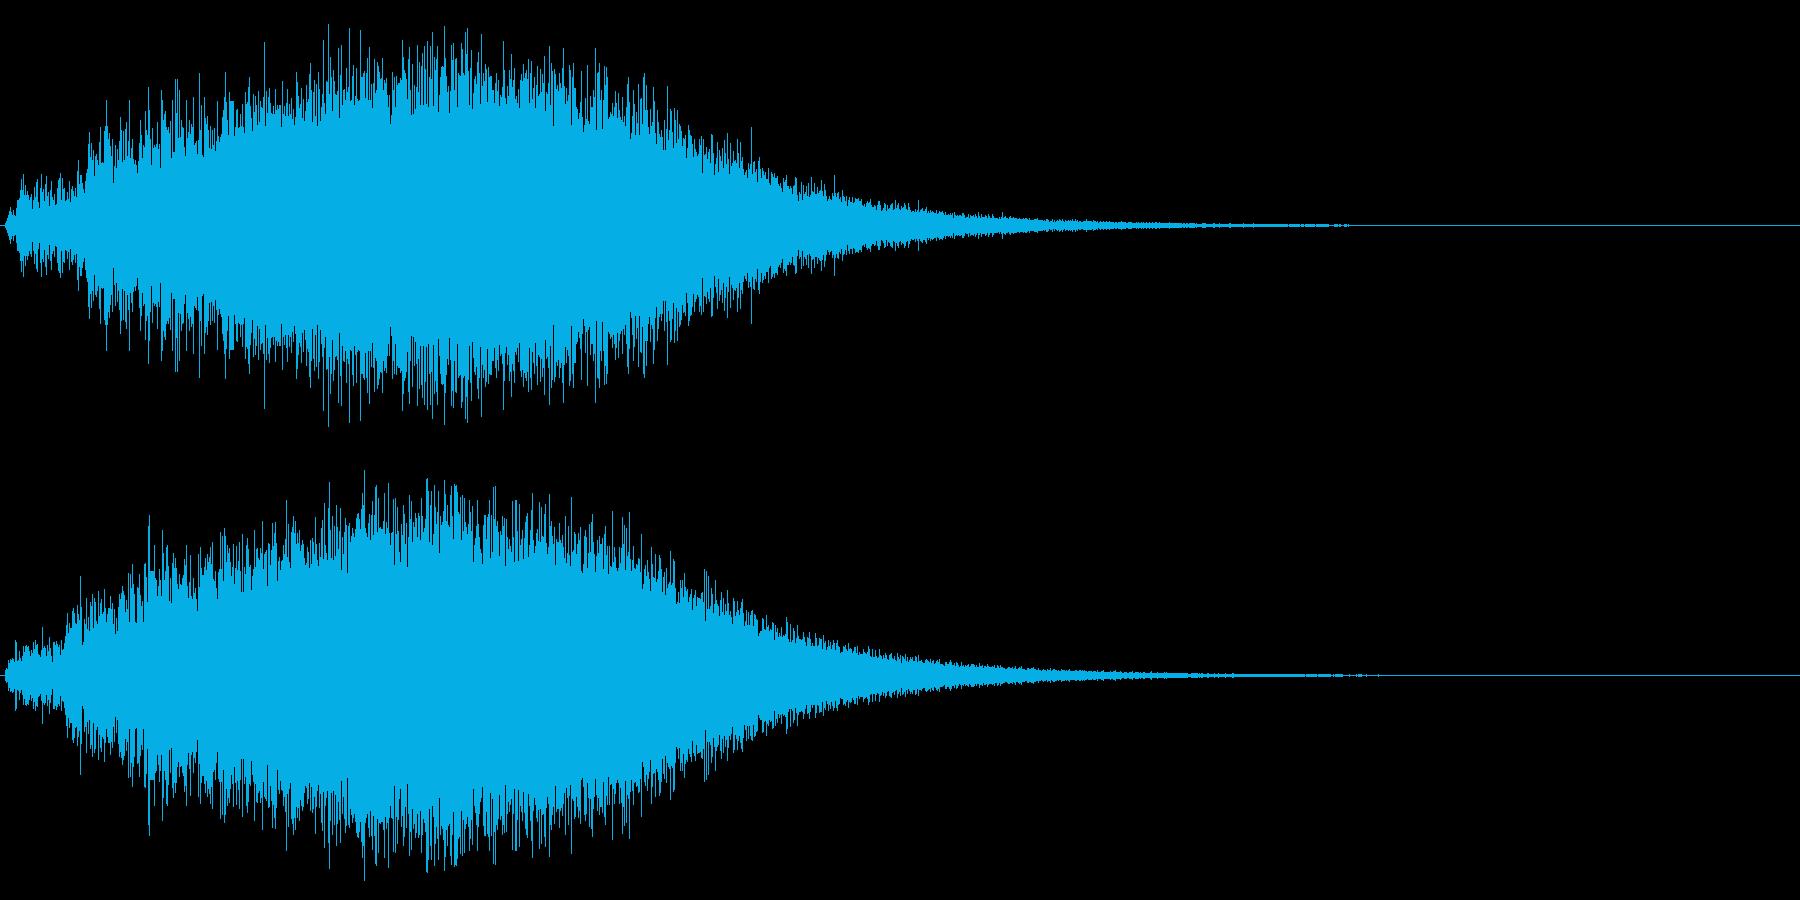 Dark_SweepUp-03Delayの再生済みの波形